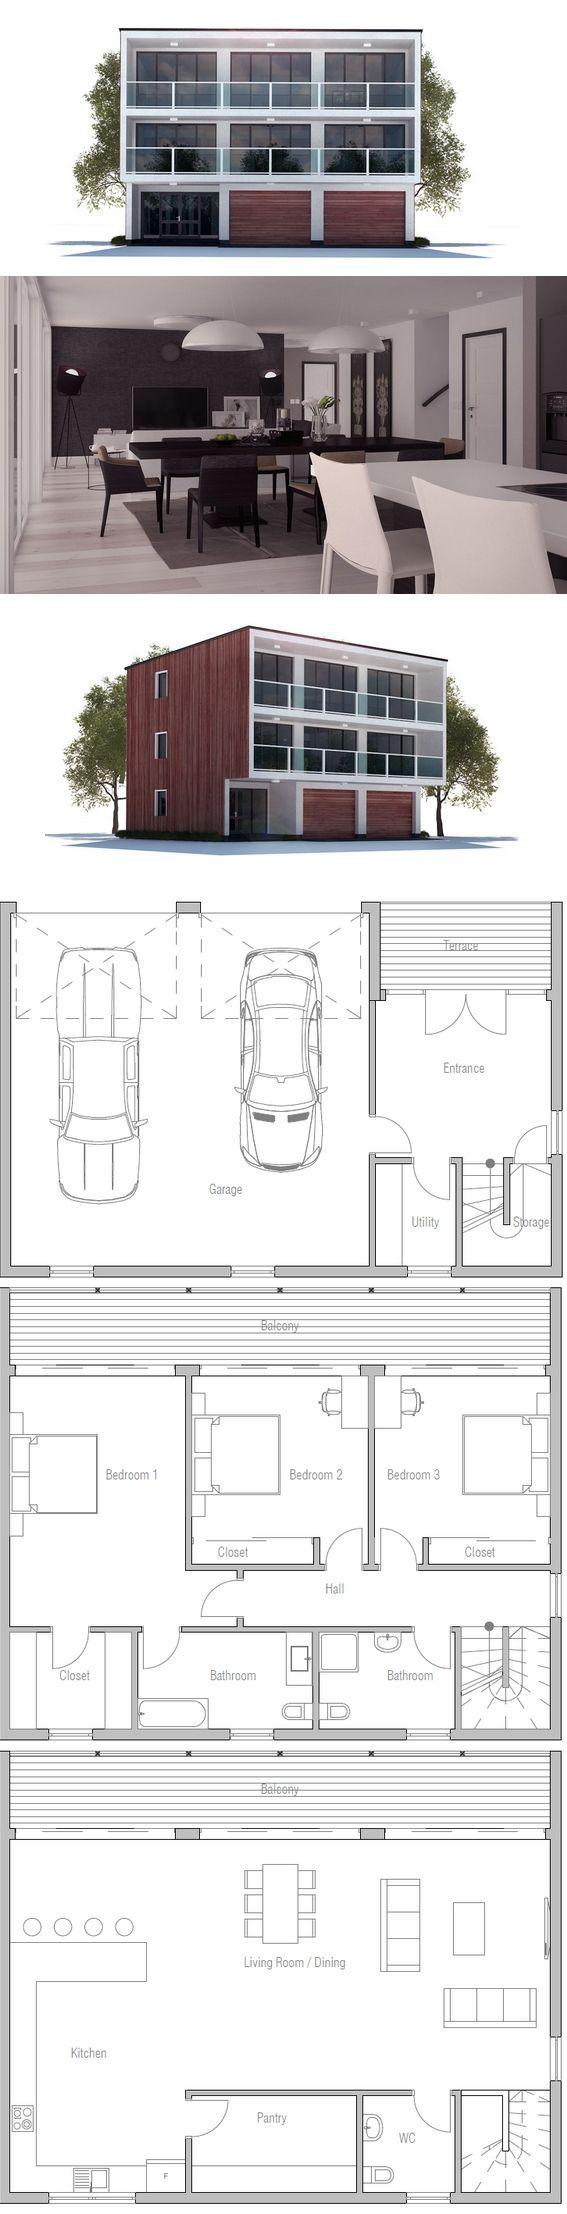 17 best images about duplex fourplex plans on pinterest for Fourplex plans with garage